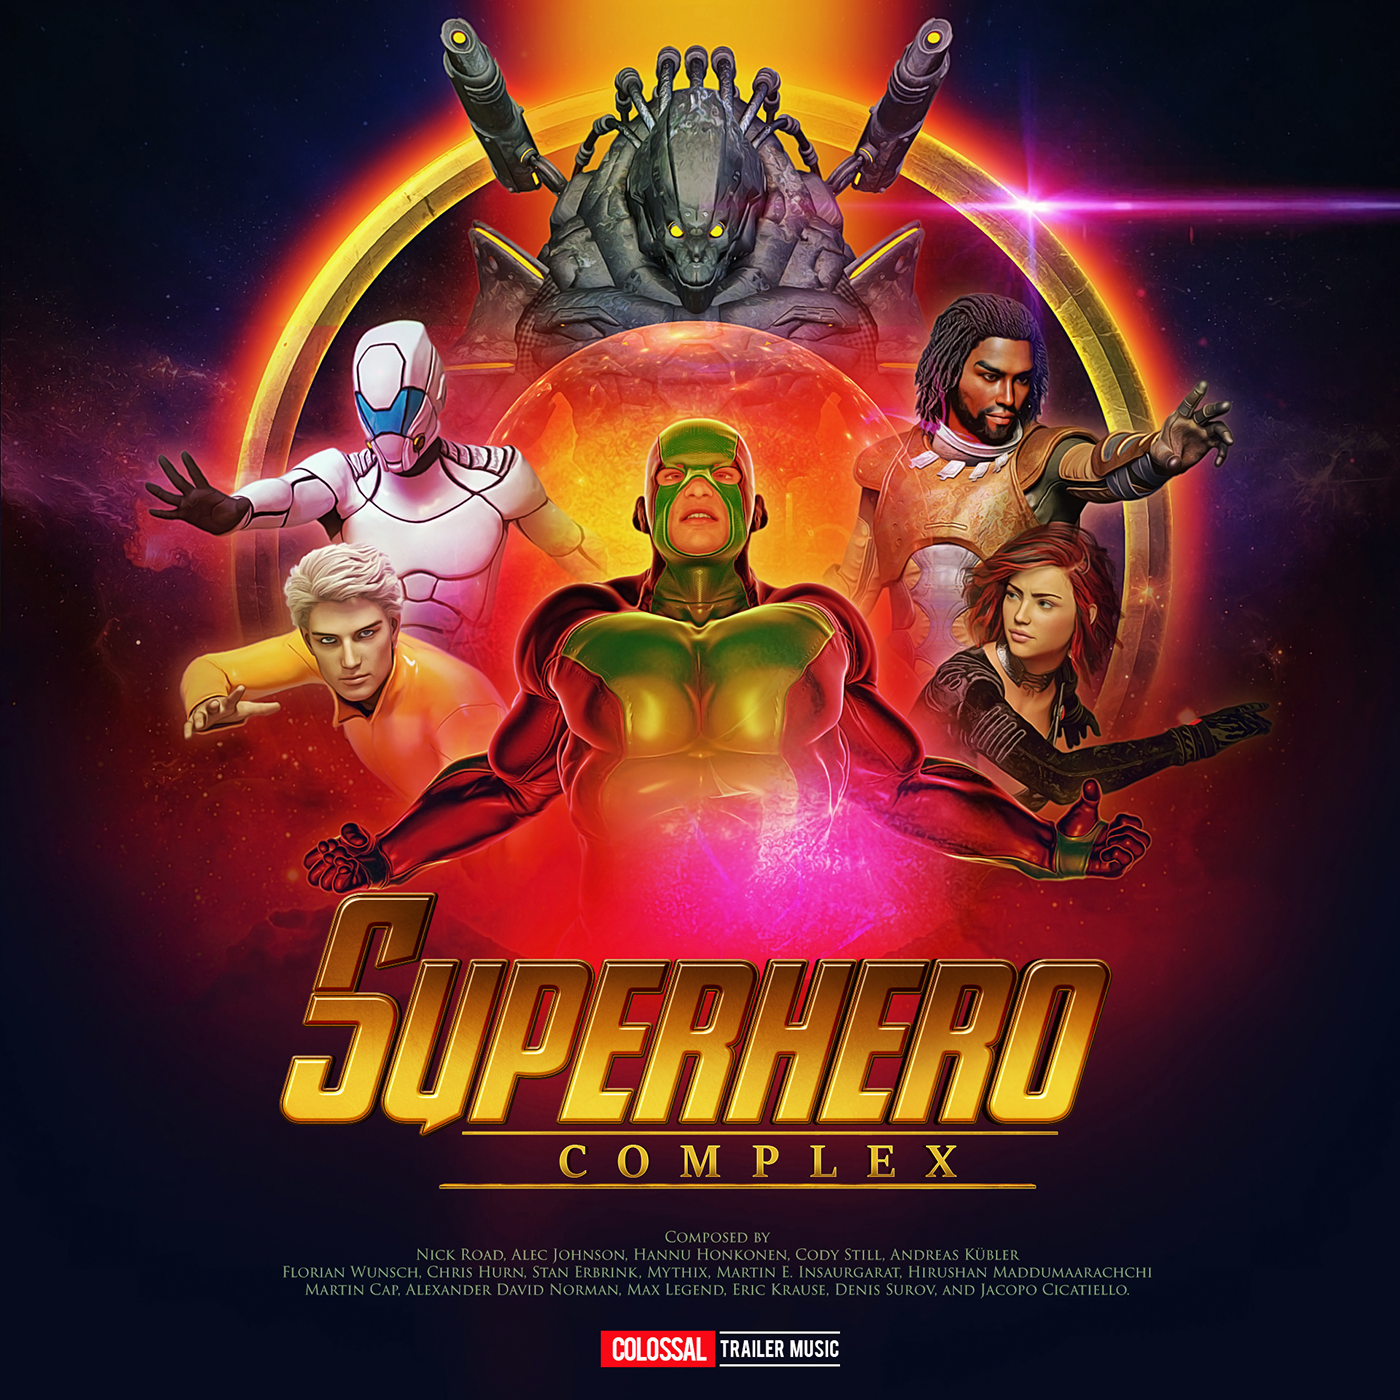 Superhero Complex